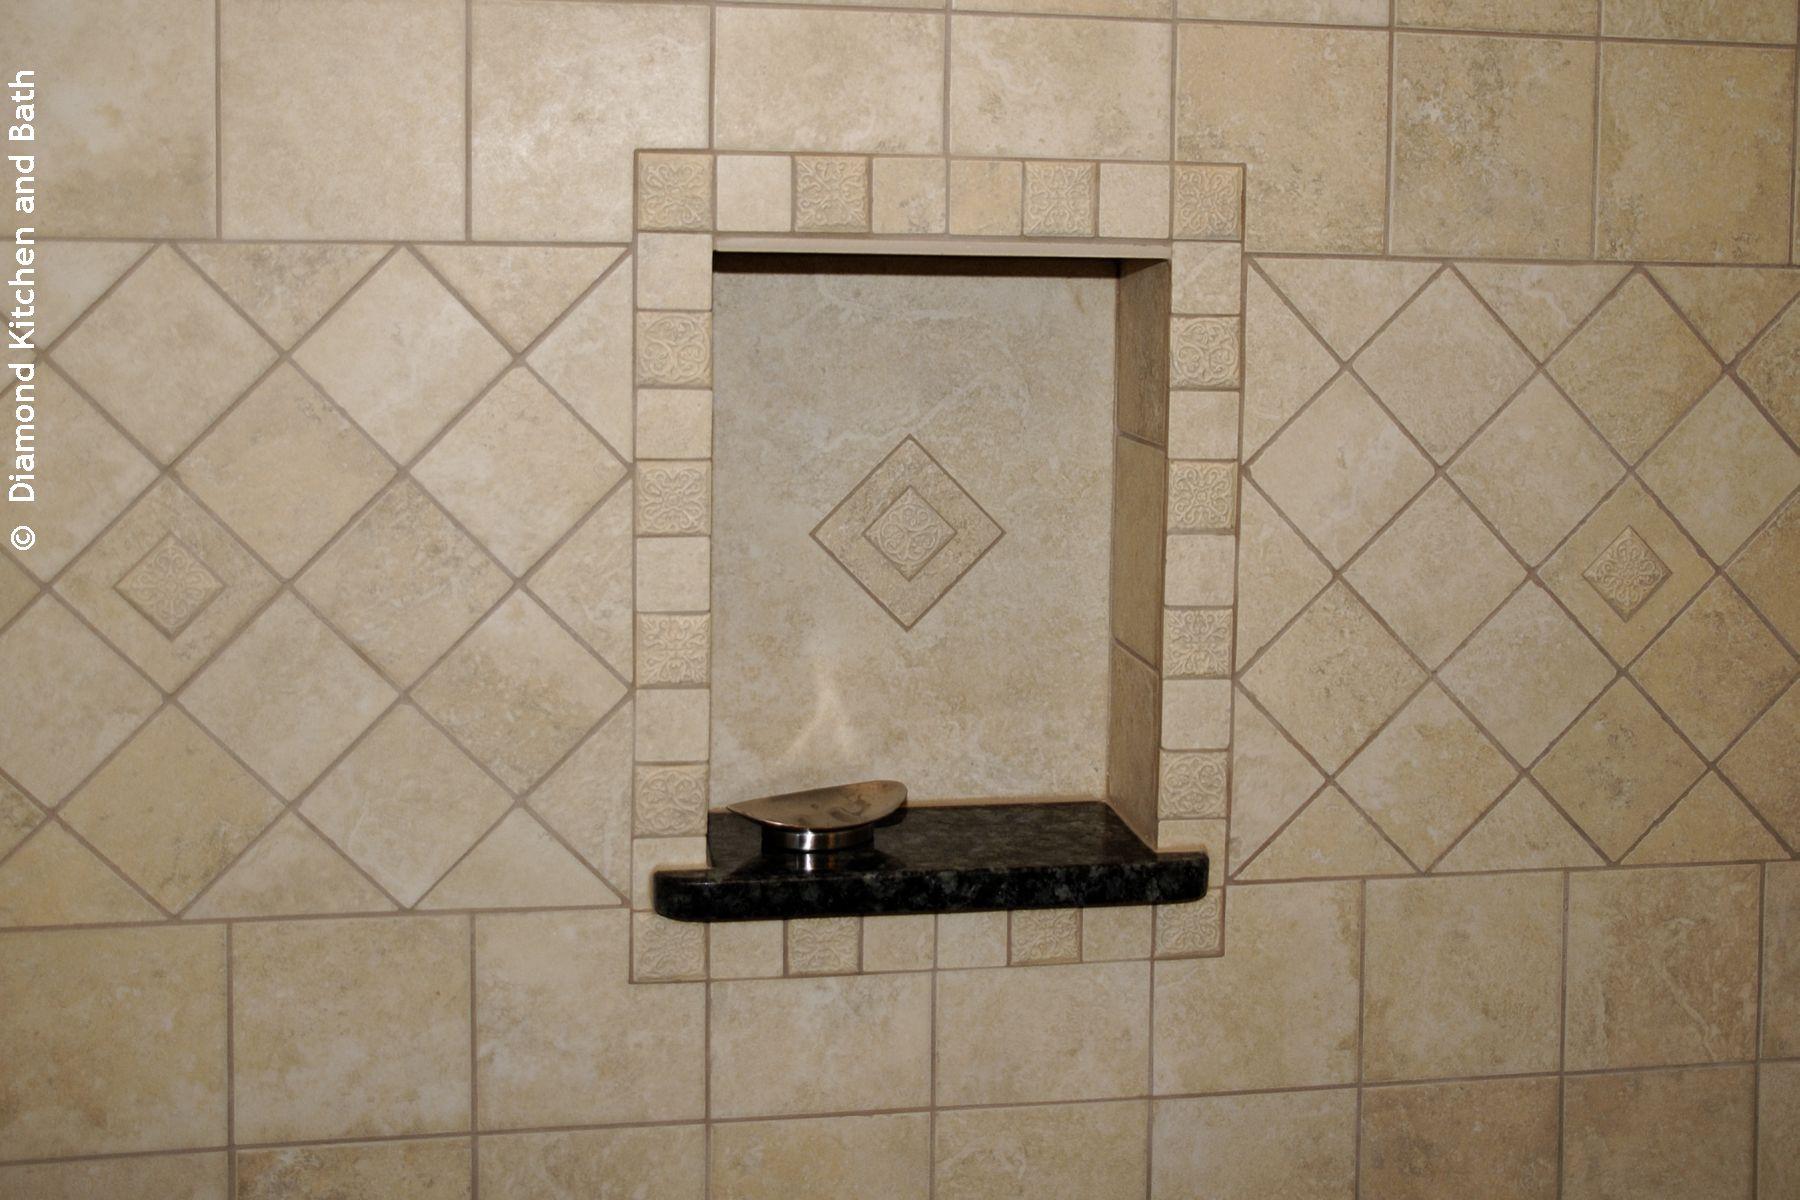 Remodel 12x12 kitchen joy studio design gallery best for Bathroom ideas 5x10